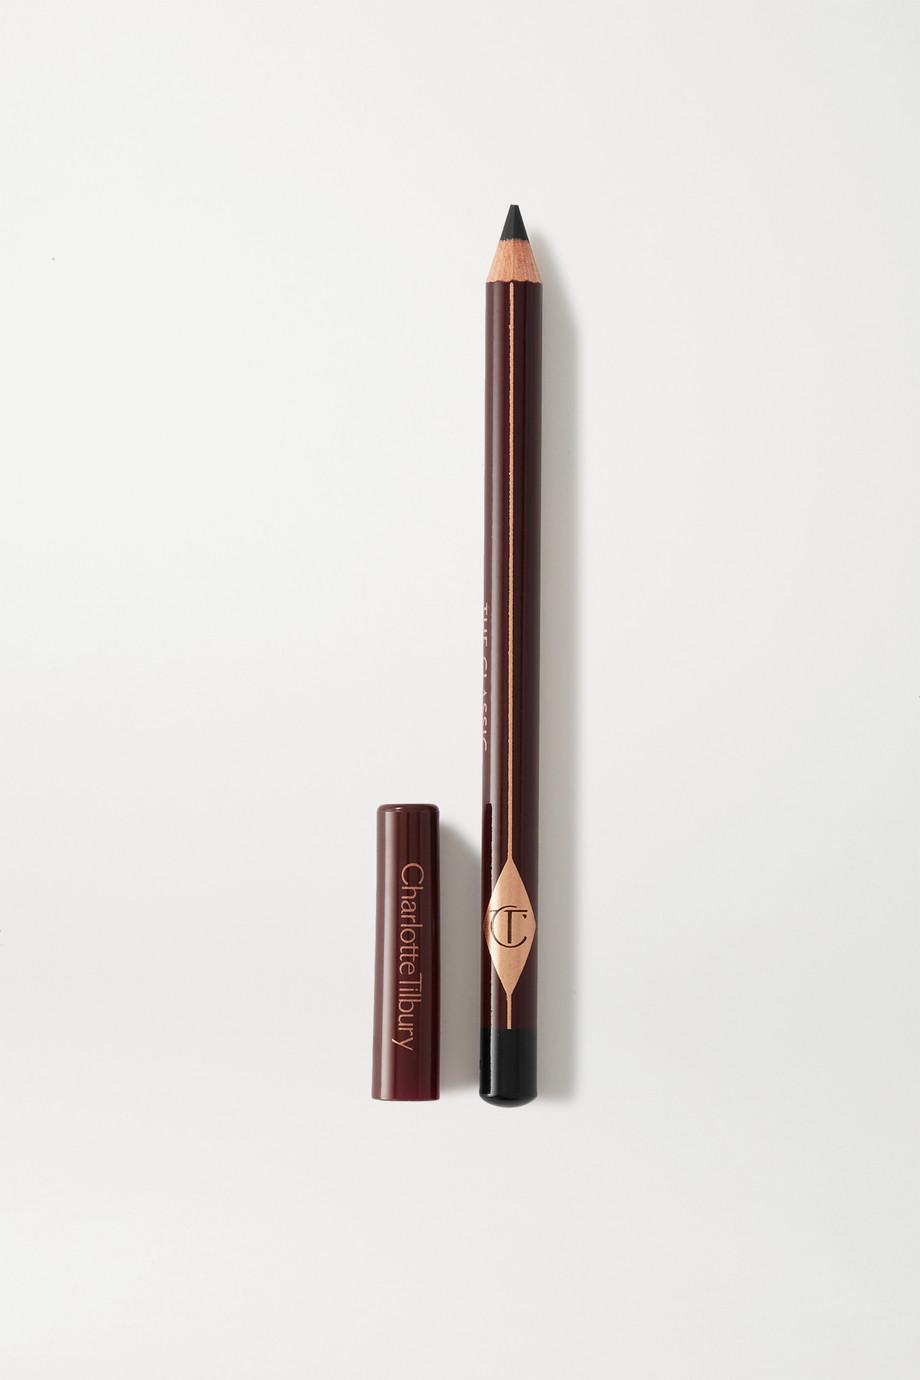 Charlotte Tilbury The Classic Eye Powder Pencil - Classic Black